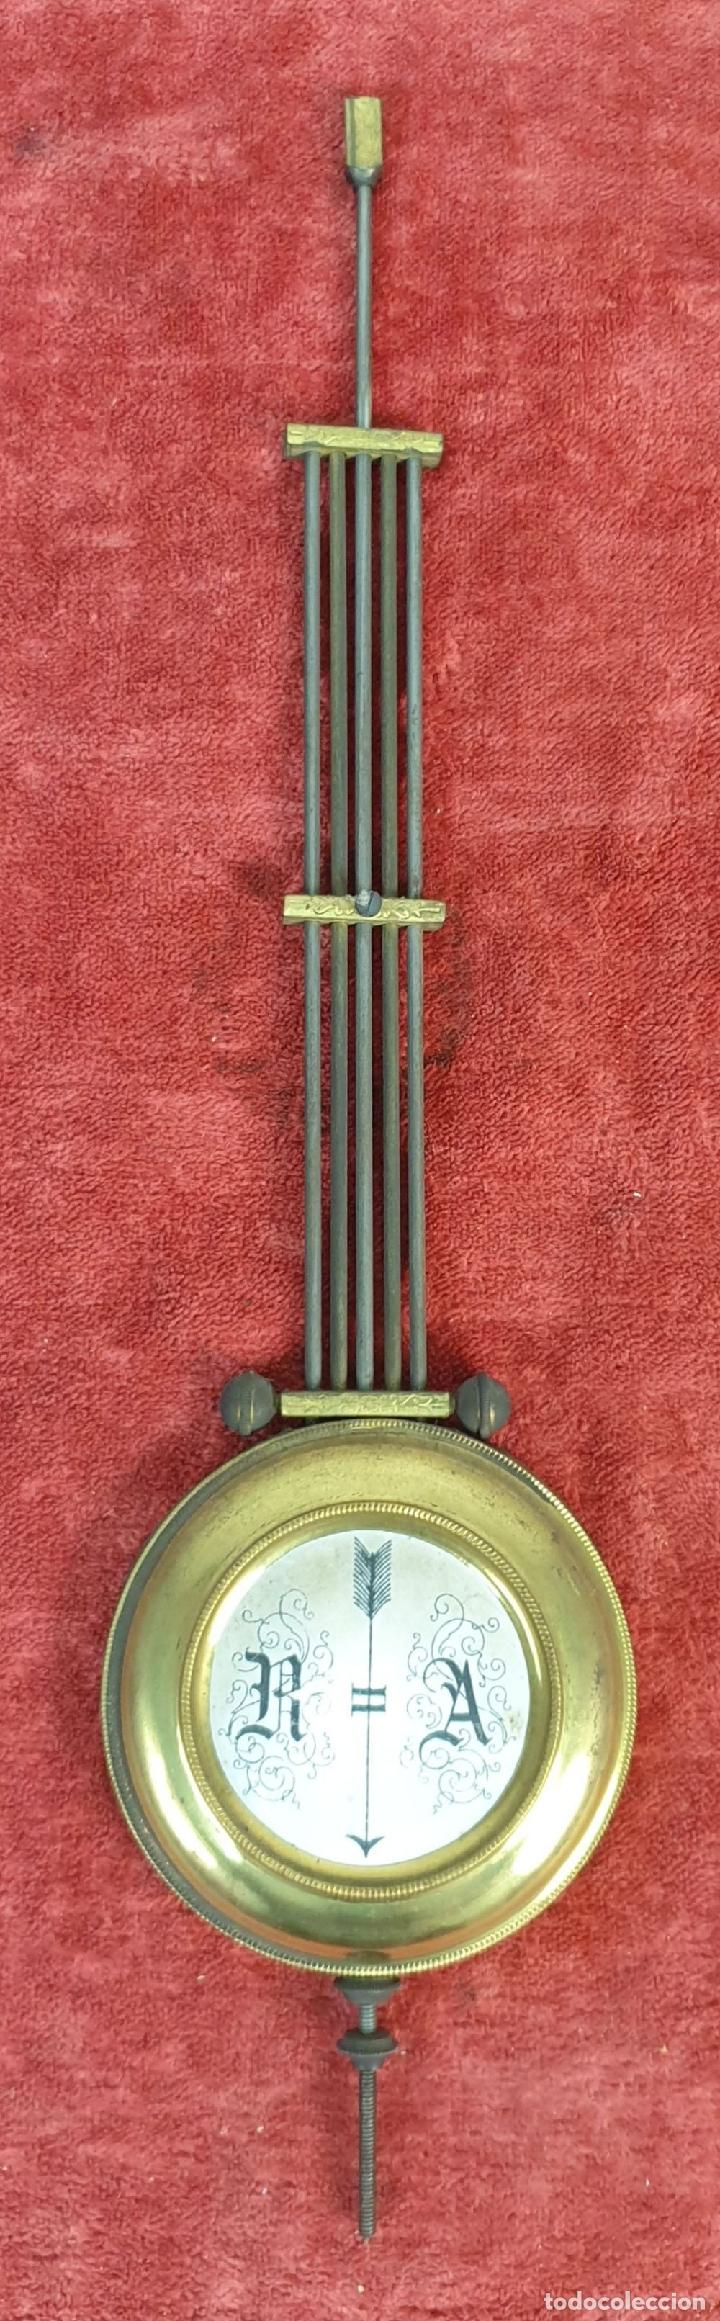 Relojes de pared: RELOJ DE PARED. MADERA. ESTILO ALFONSINO. MAQUINARIA SUIZA. SIGLO XIX-XX. - Foto 17 - 182265856